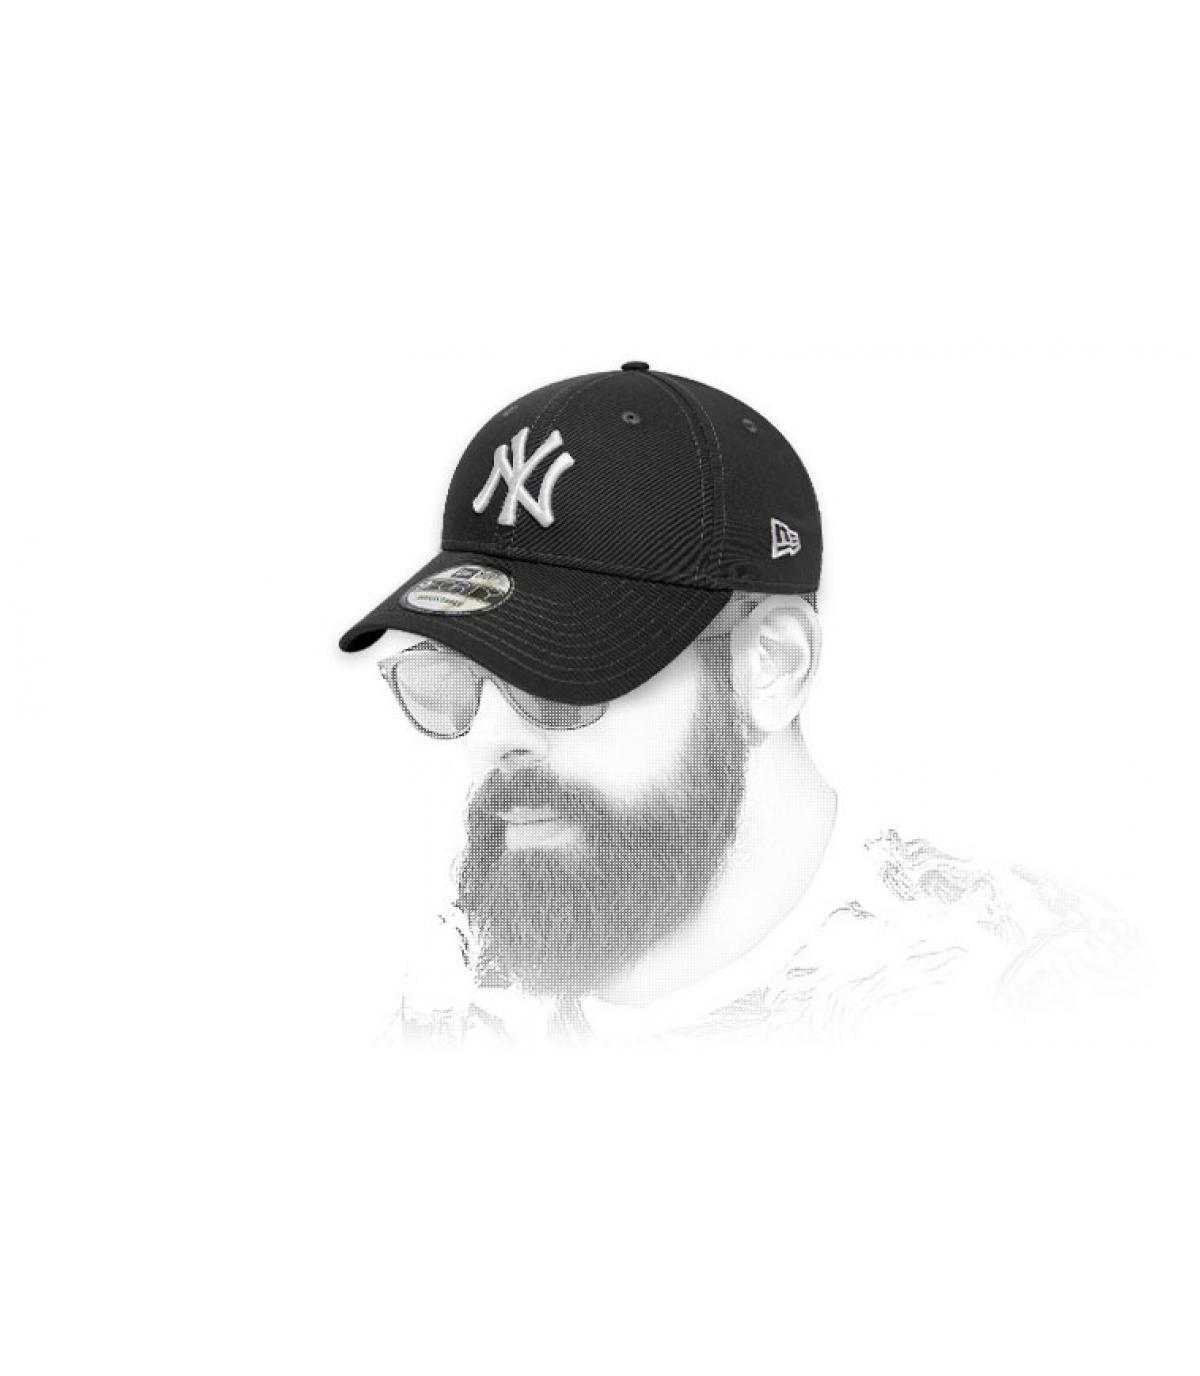 casquette NY gris blanc